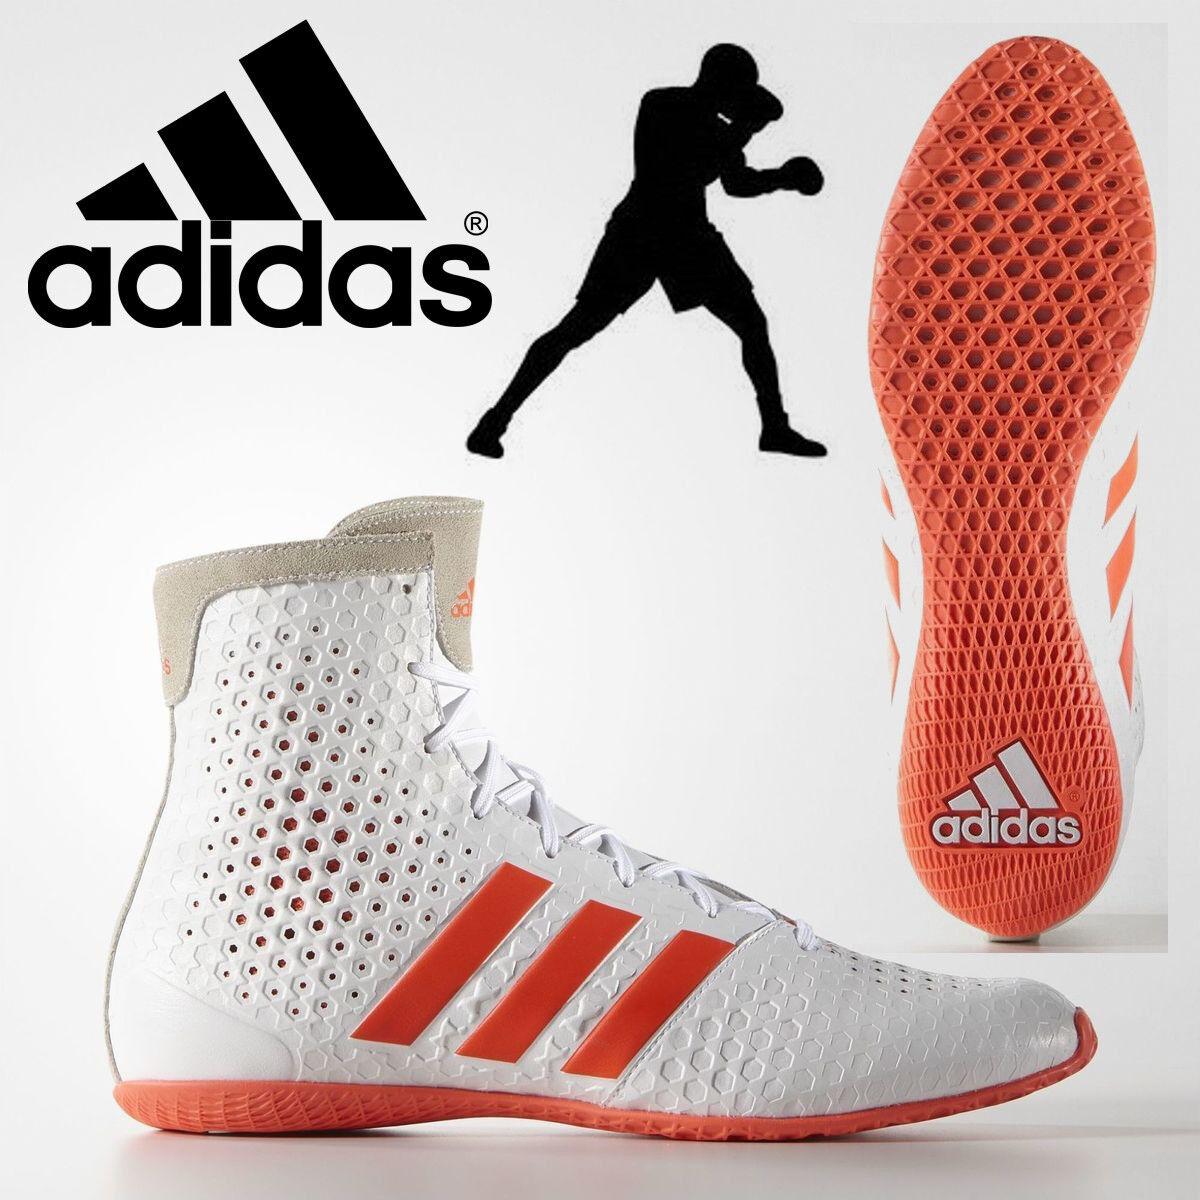 adidas KO Legend 16.1 homme Pro Boxing Bottes Retro Sports Gym Trainers  150